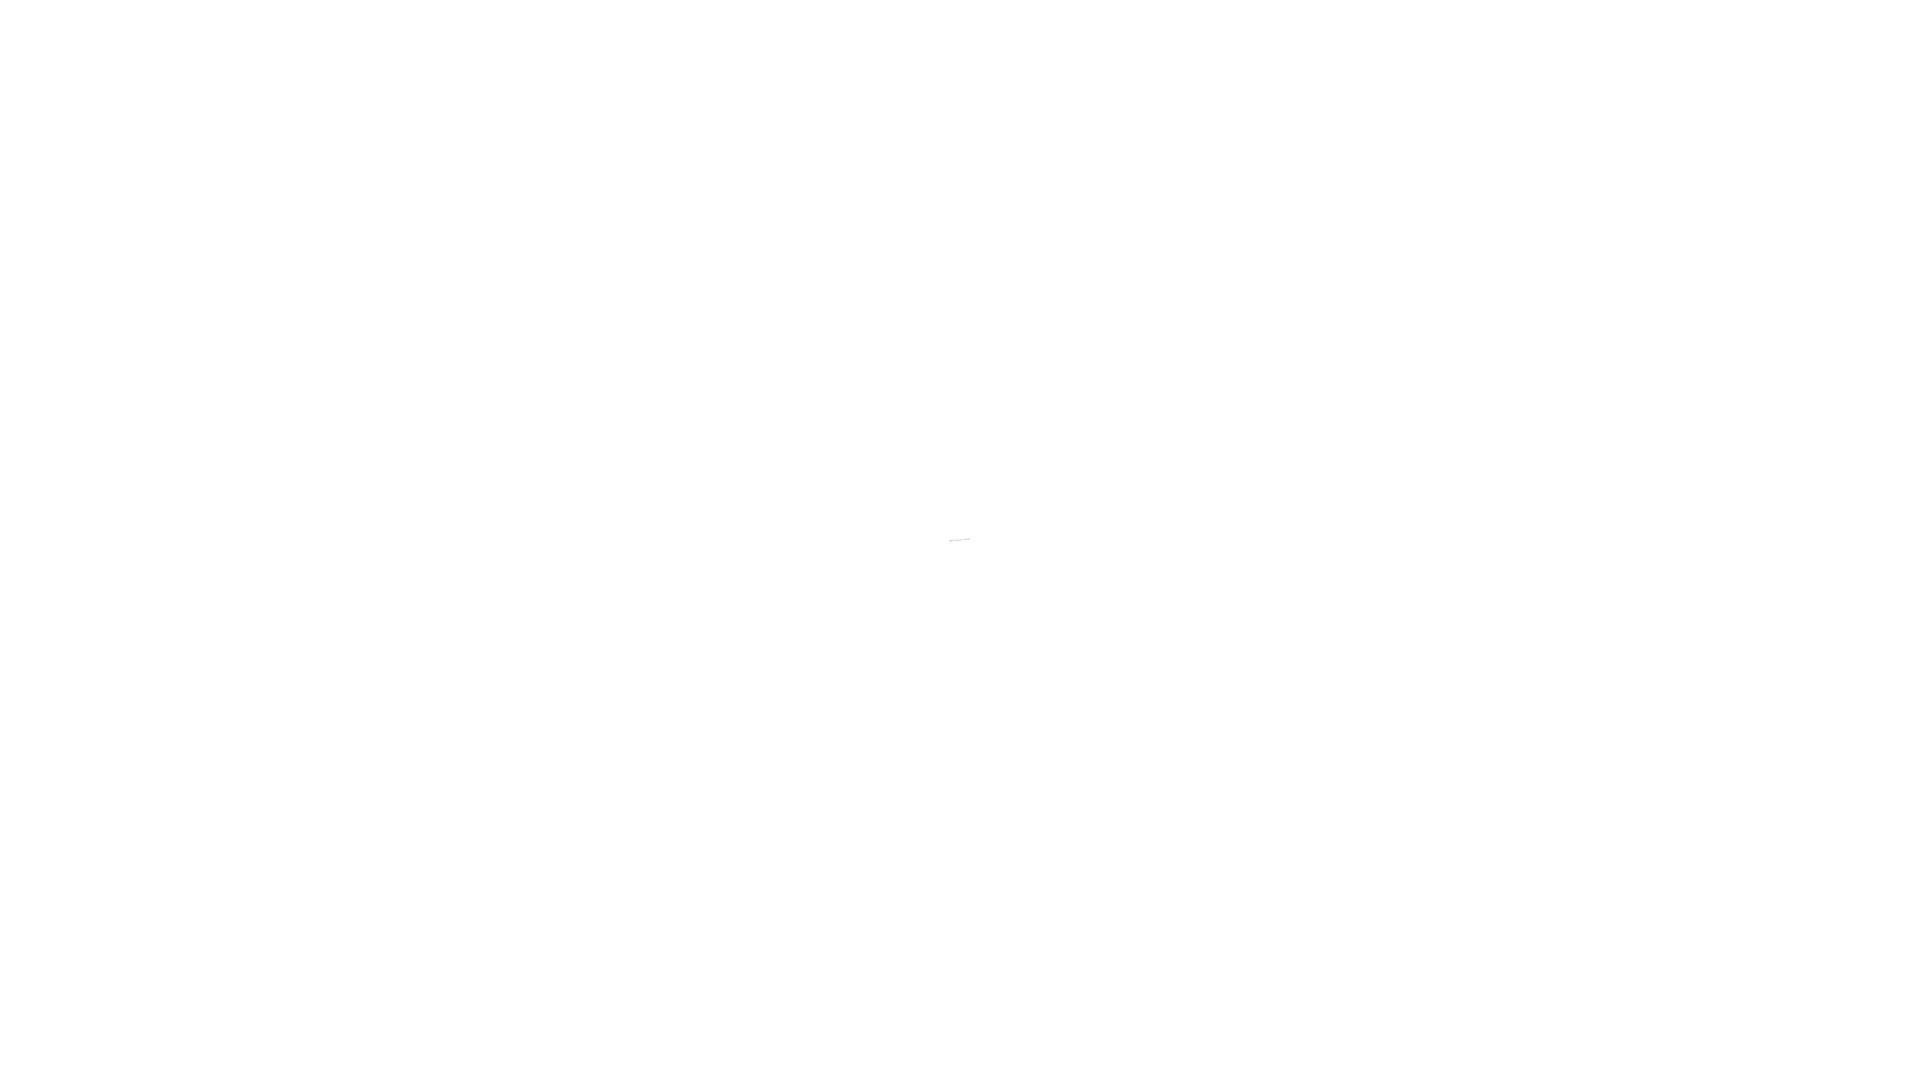 /Índice Concord Multicolor-pesta/ñas-Mylar Blindada 4 Agujeros AZ 20-Parte A4 Blanca Ref CS21